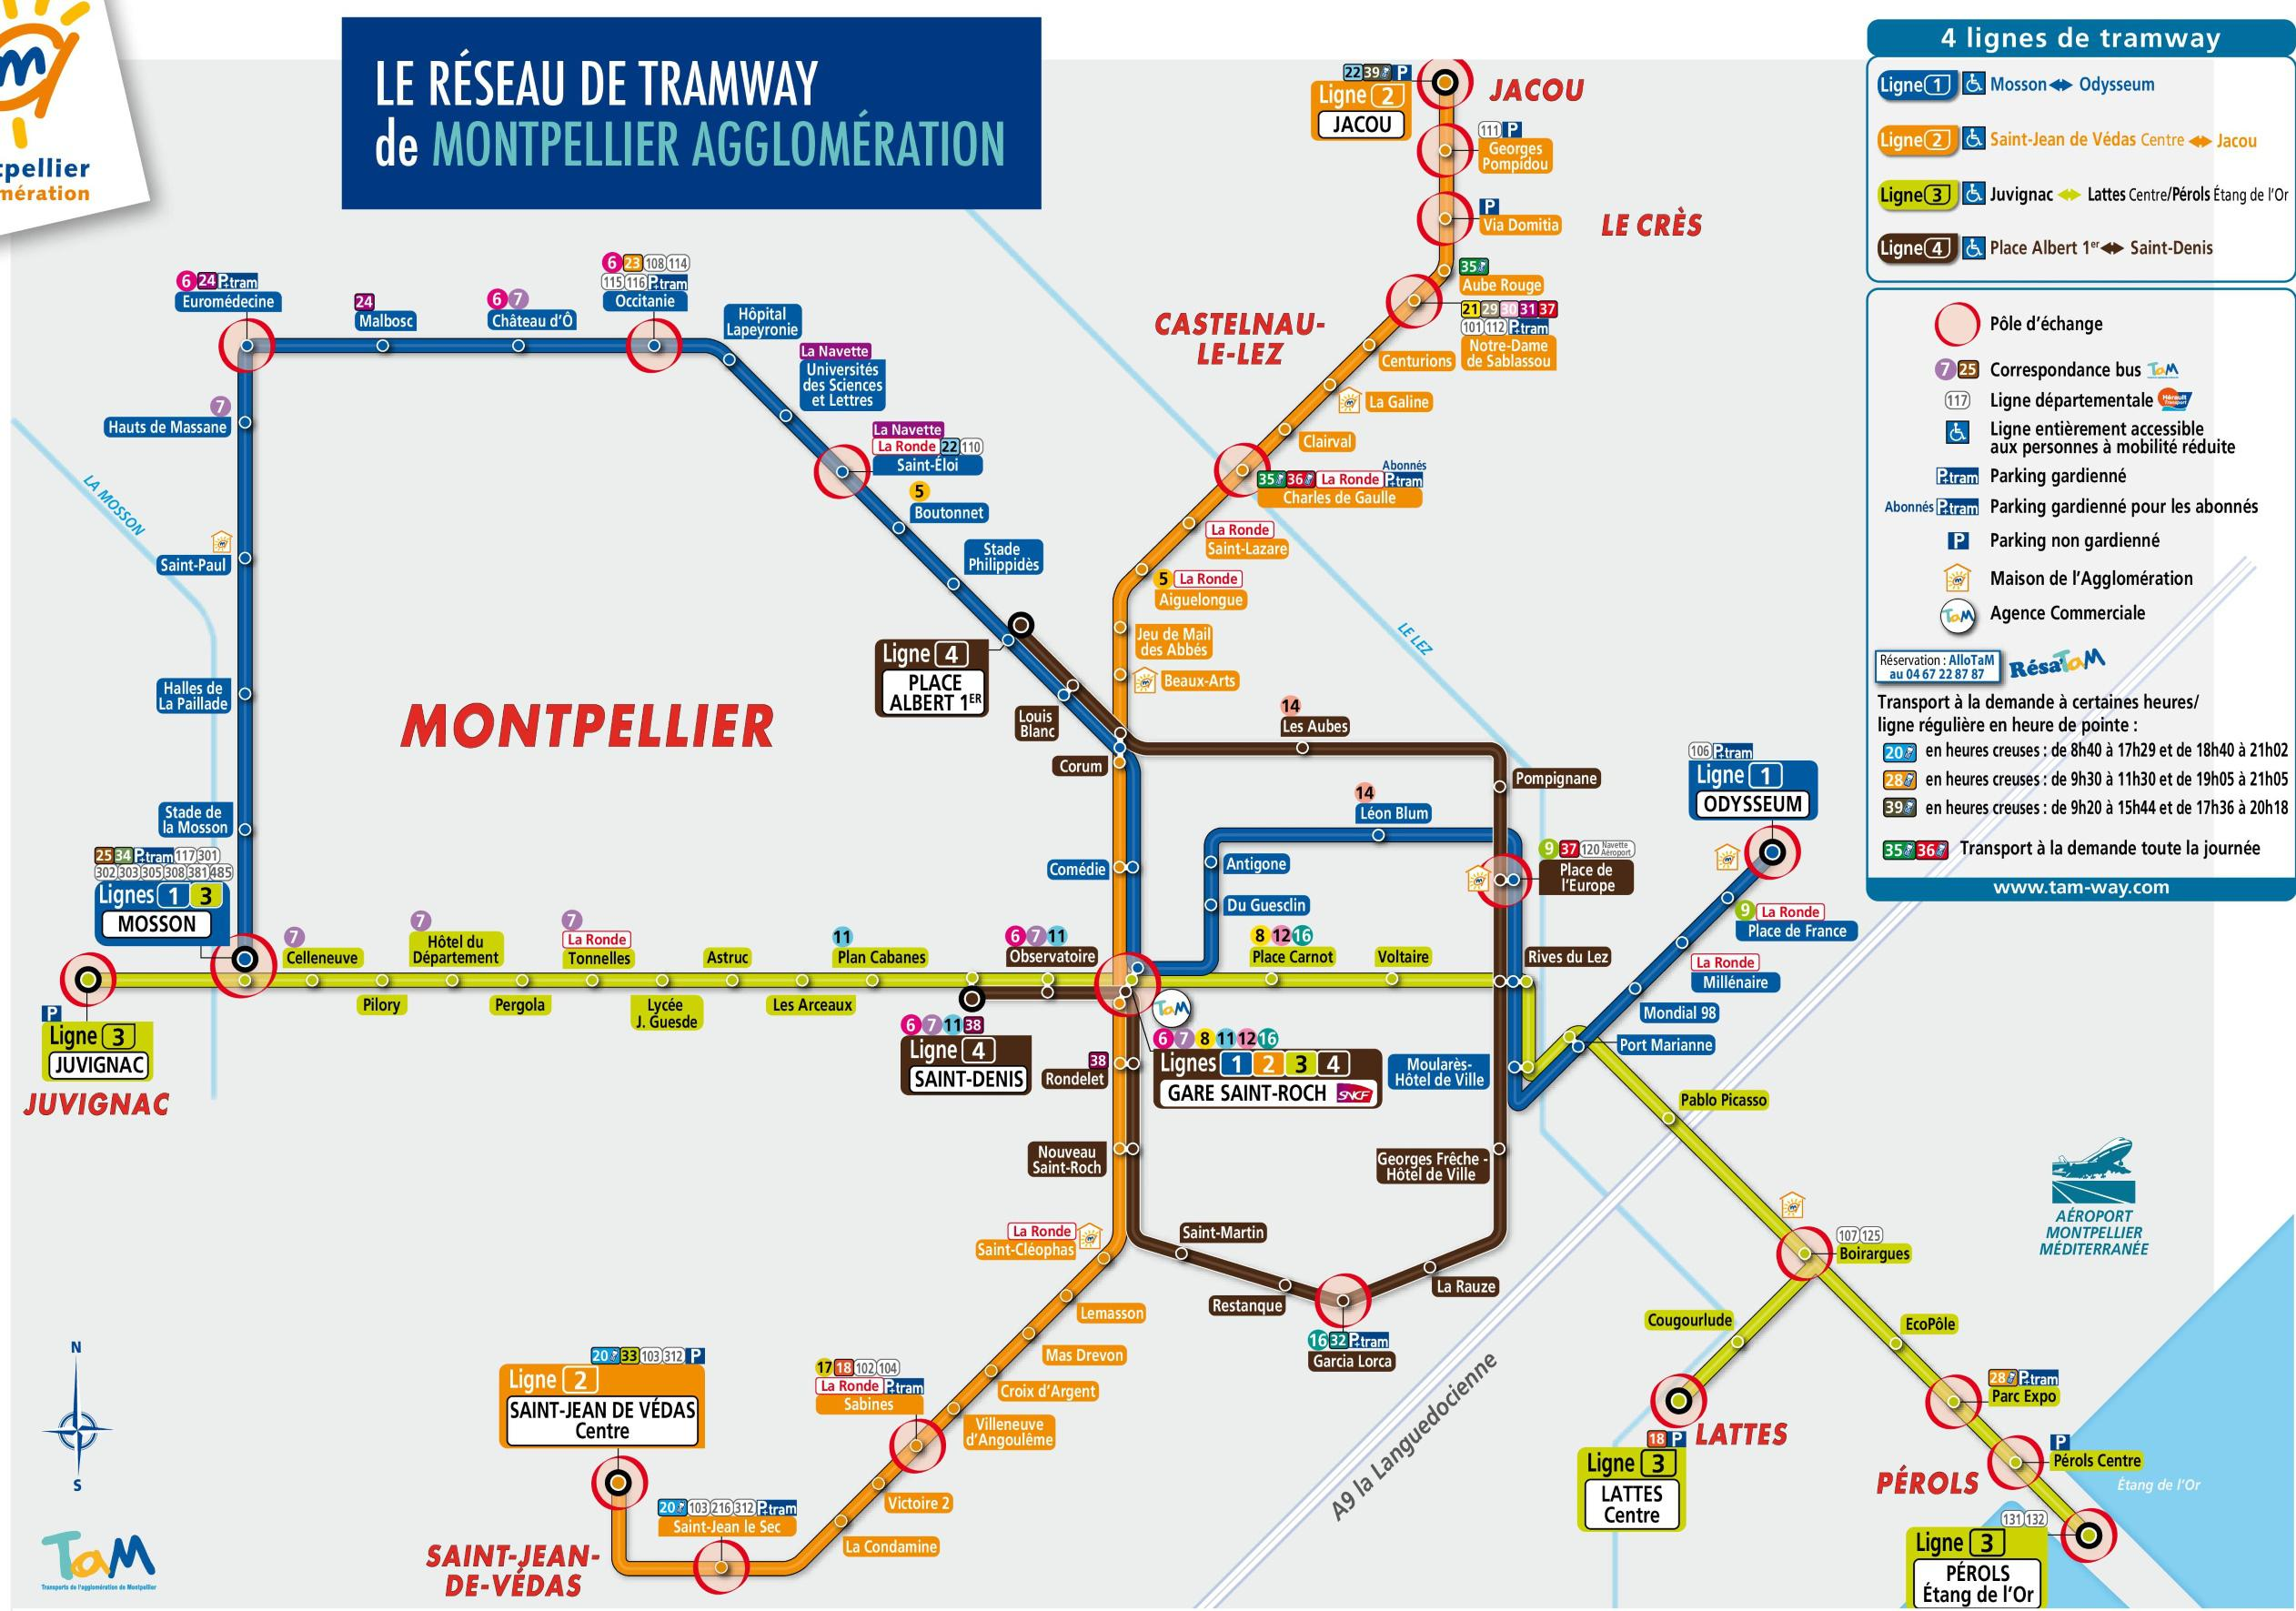 Plan du tramway de Montpellier